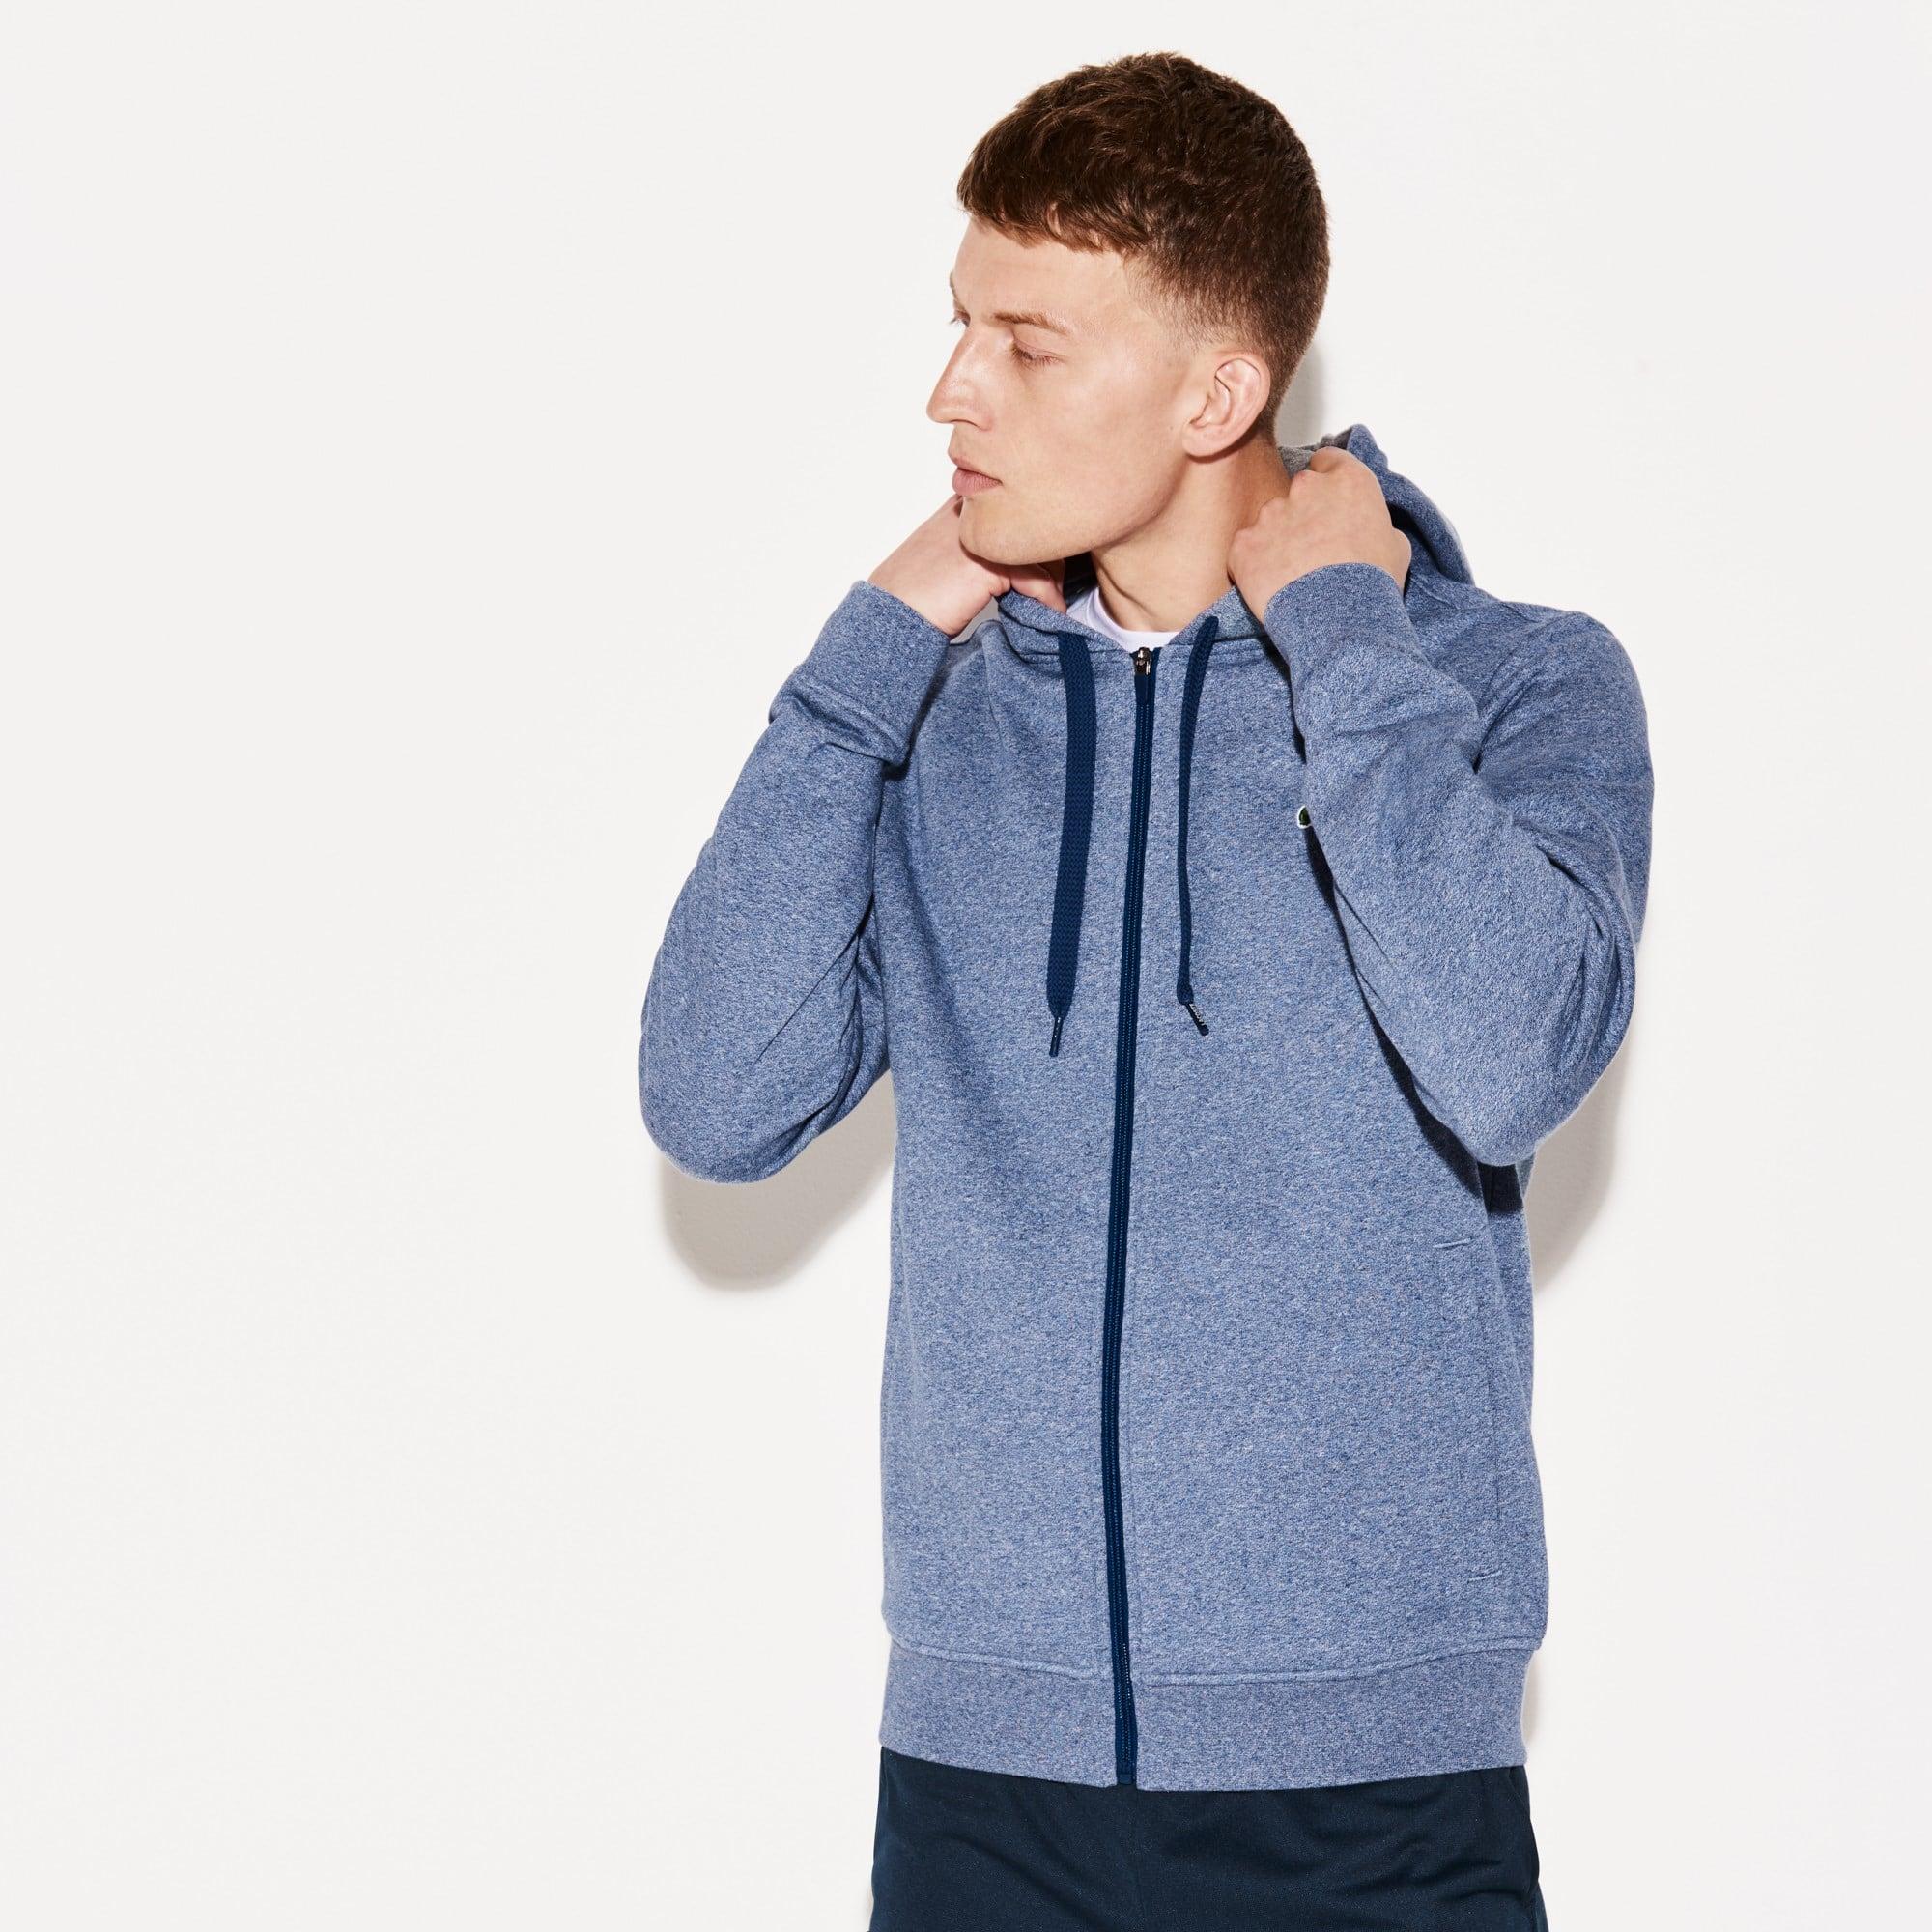 Men's Lacoste SPORT Tennis hooded zippered sweatshirt in fleece